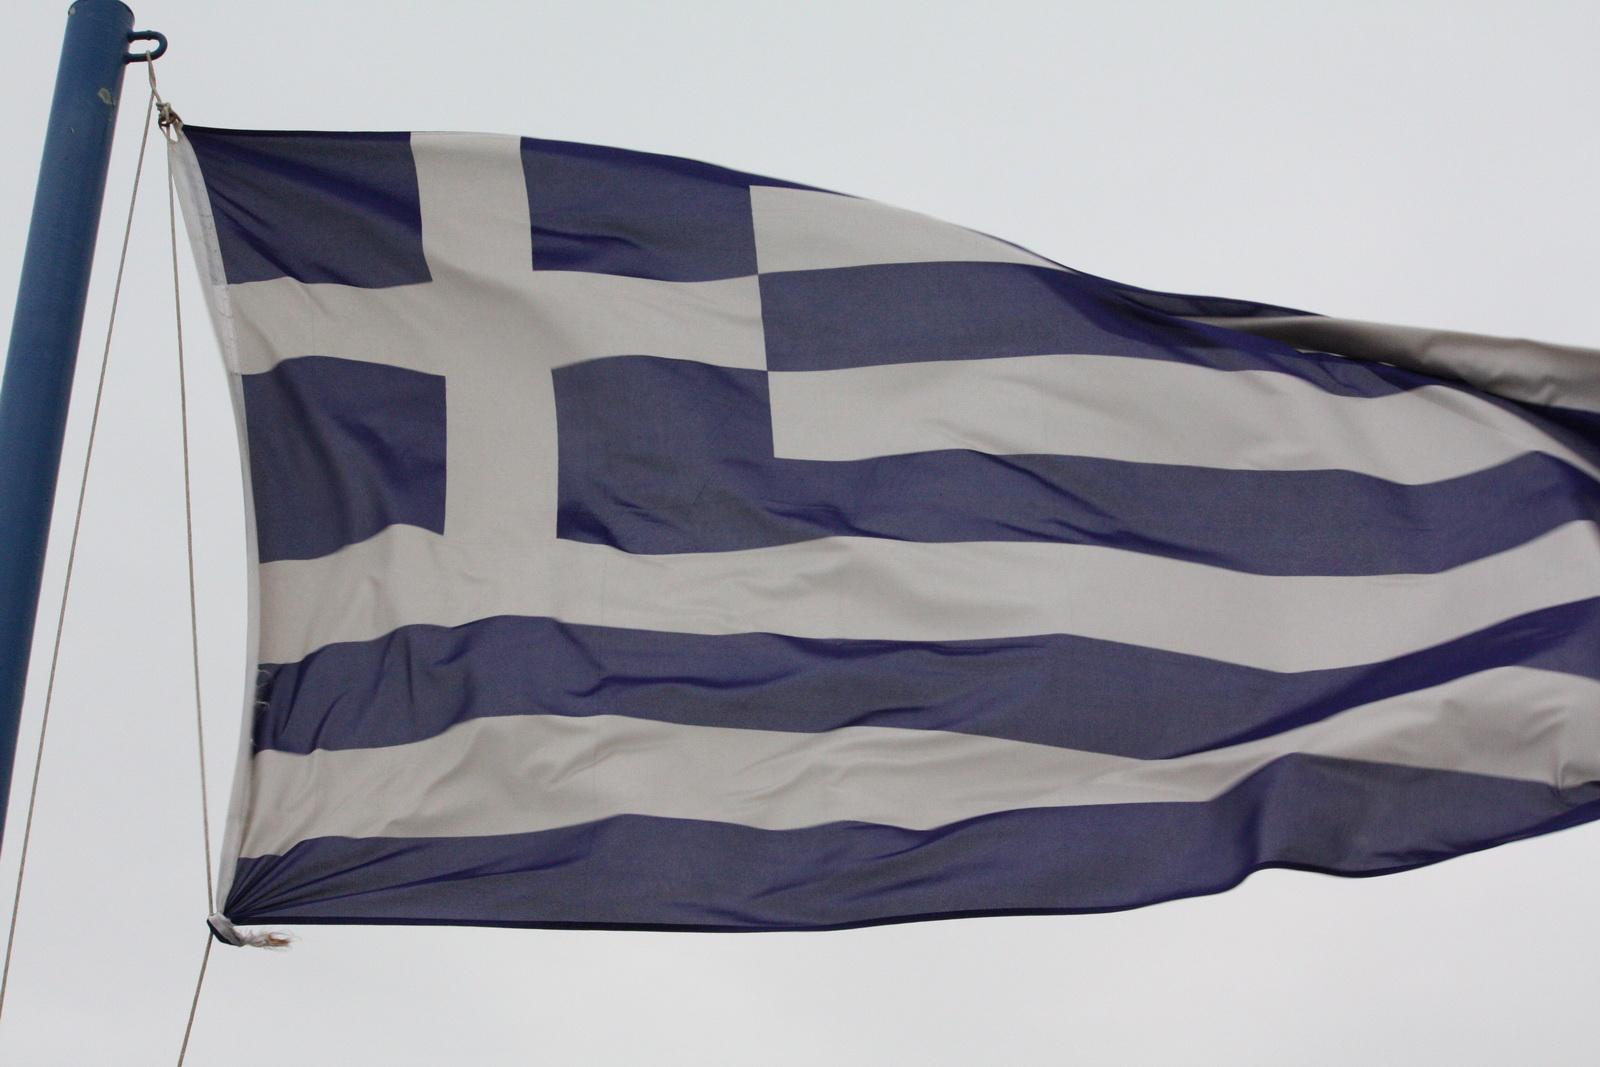 IMG_0691 σημαία_resize